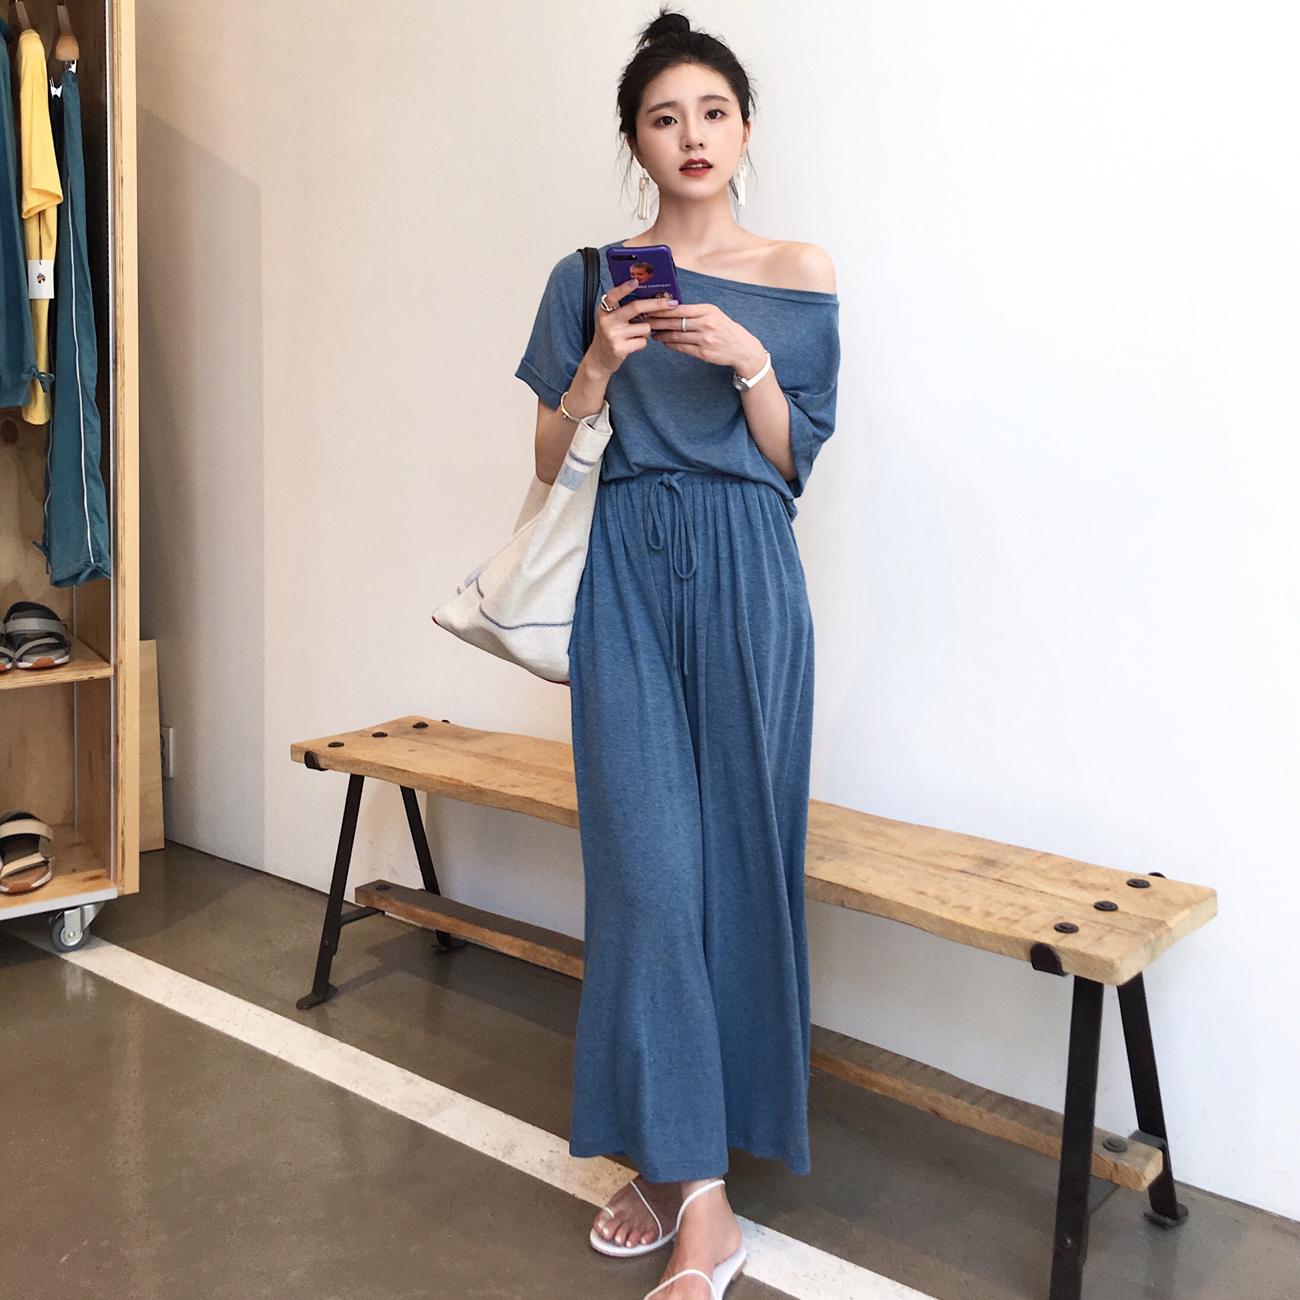 ◆ASM◆2018夏季新品针织短袖T恤裤子两件套装显瘦宽松休闲裤女装